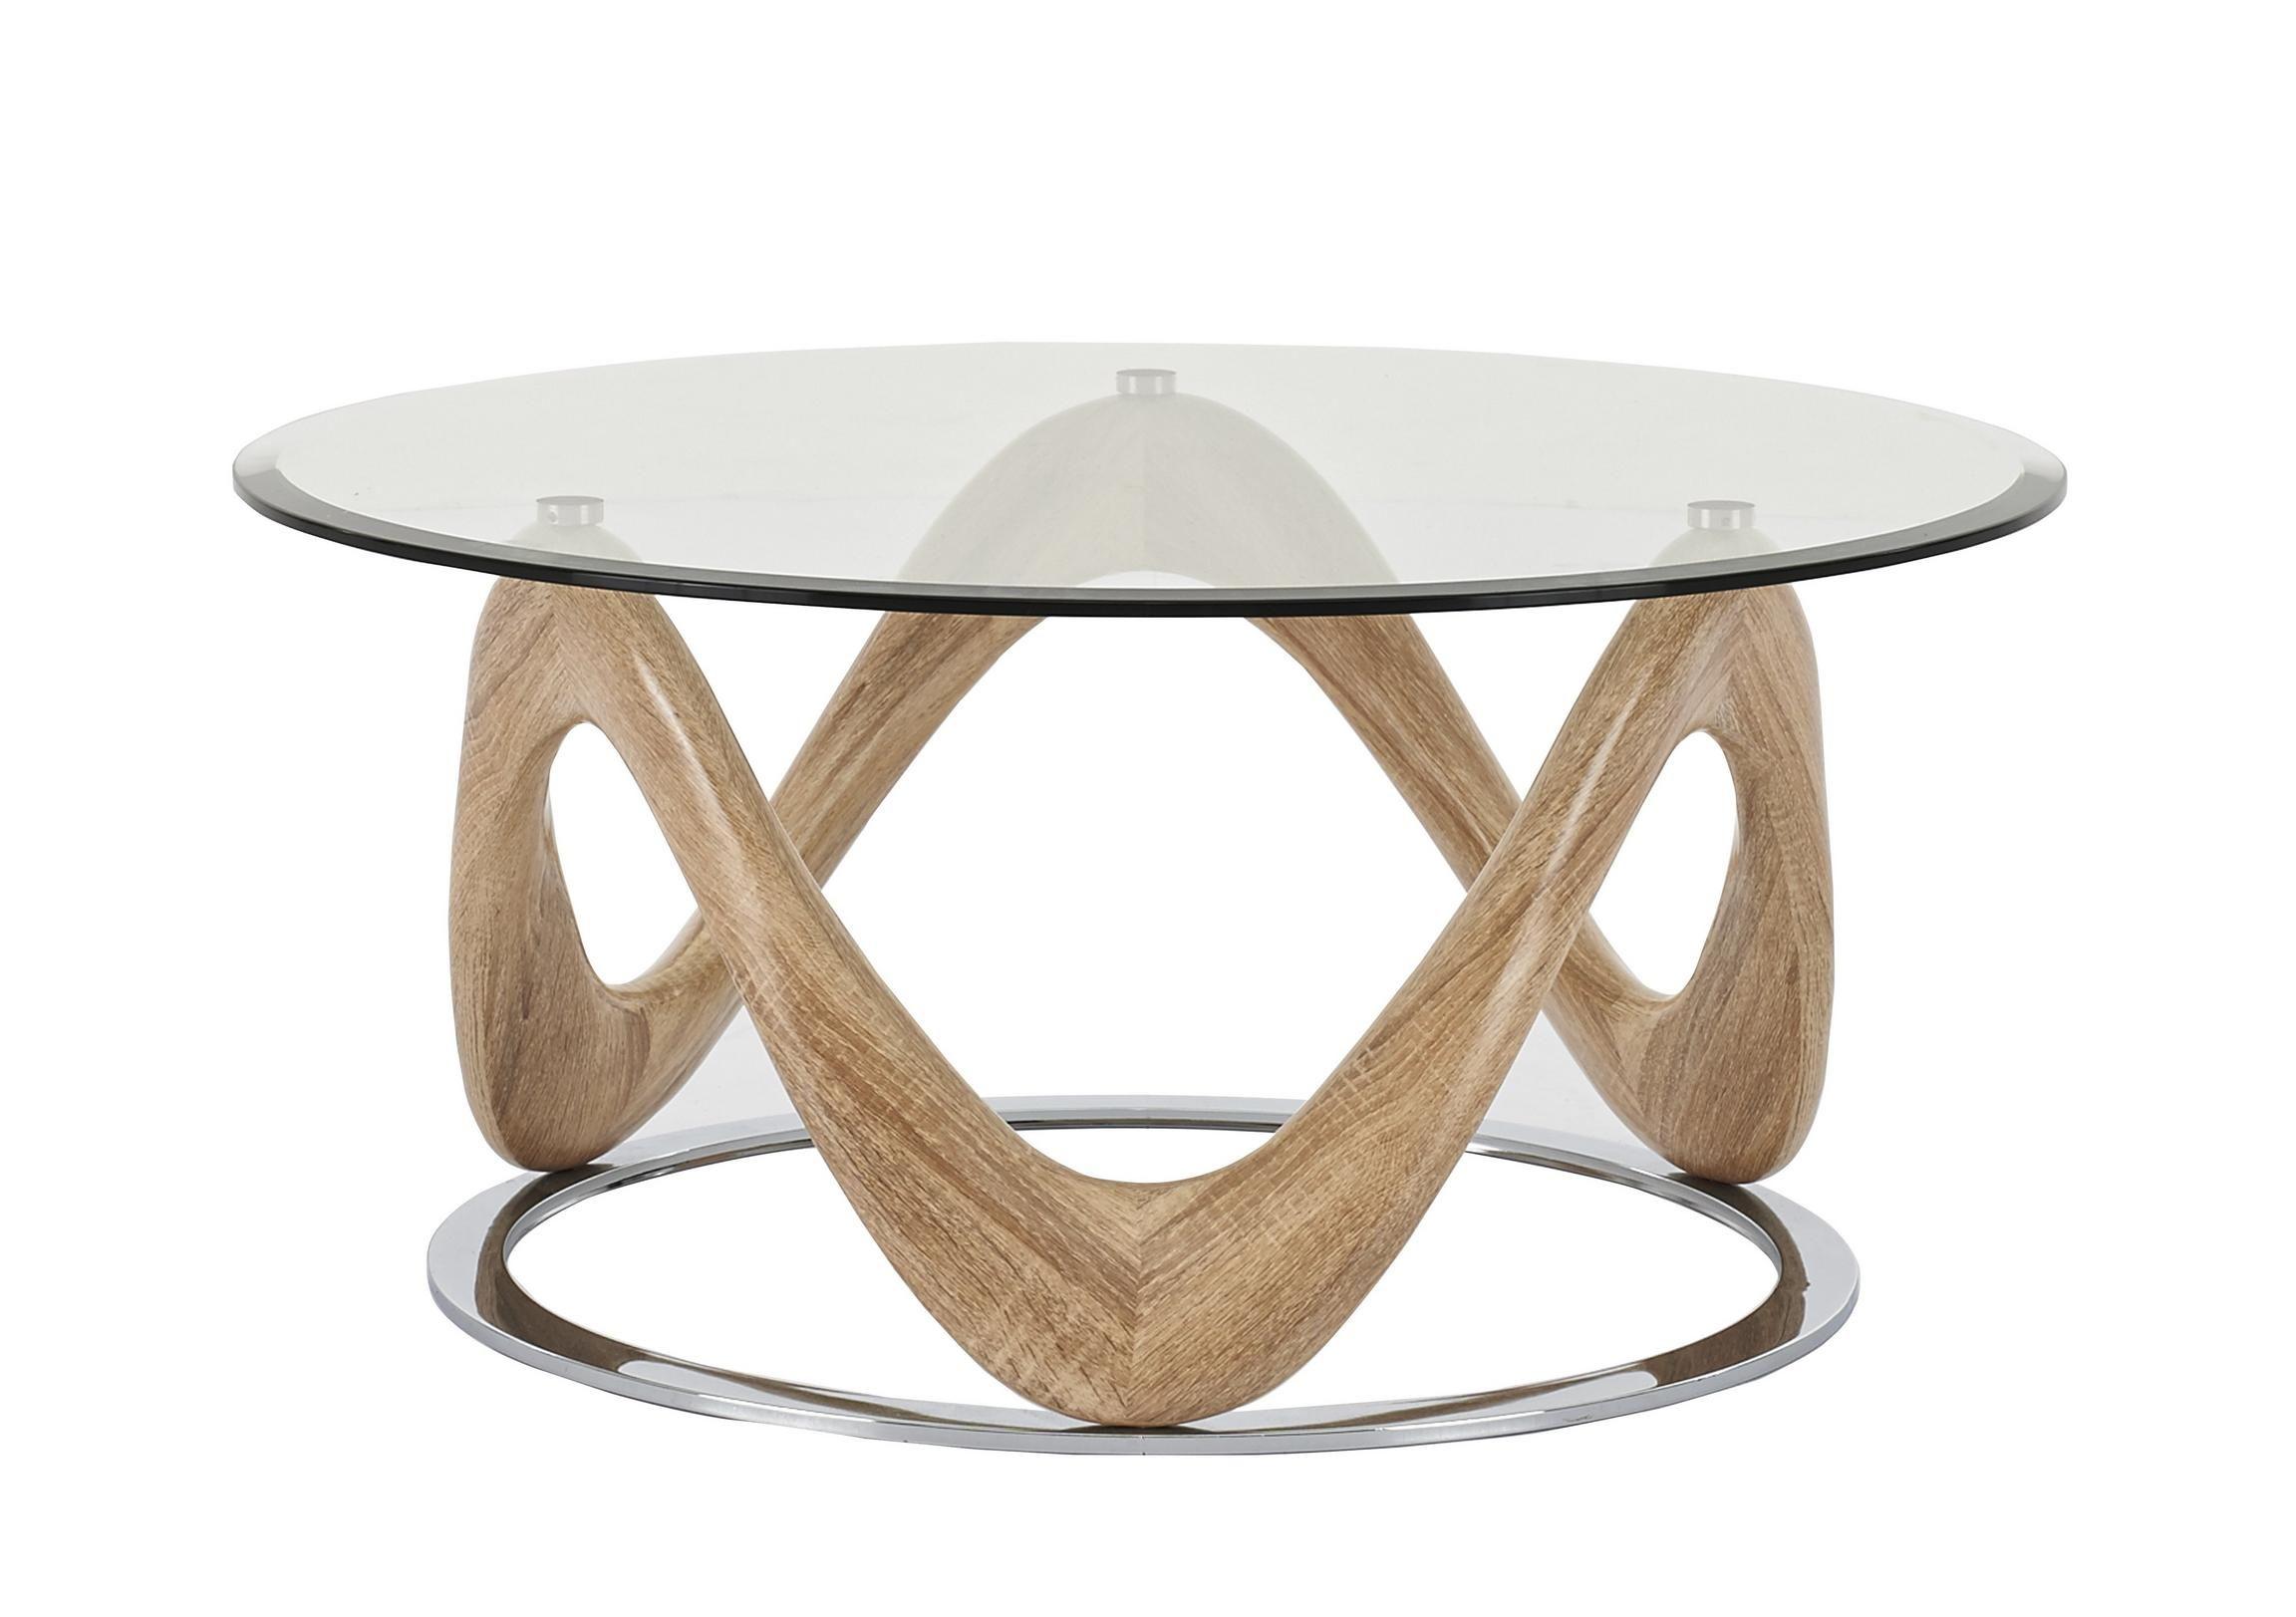 Modern Round Glass Coffee Table Table Design And Decoration Metal Dekor Aksesuarlar [ 800 x 1000 Pixel ]